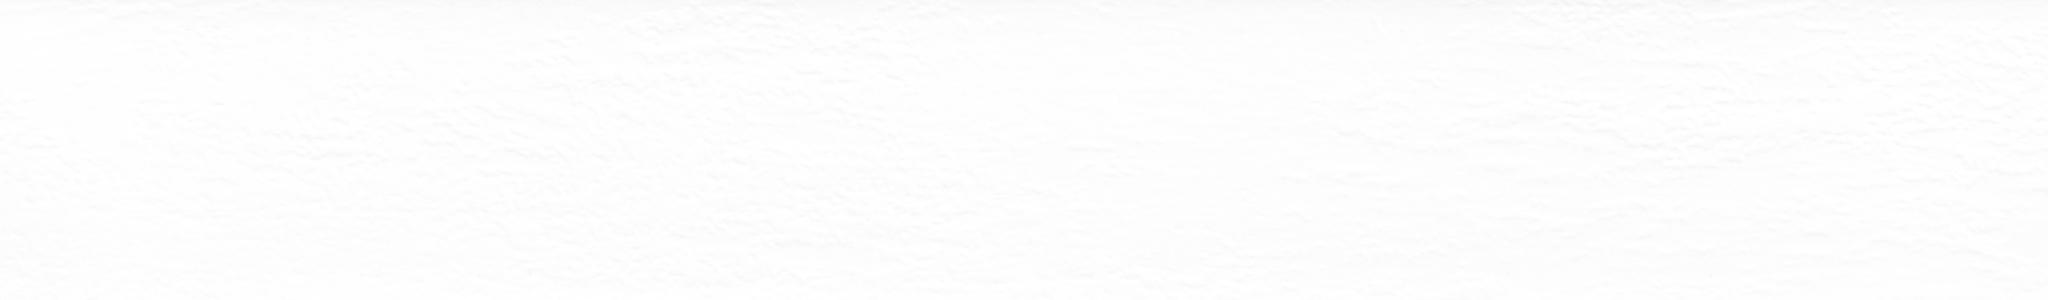 HU 104401 ABS hrana bílá omítka perla XI